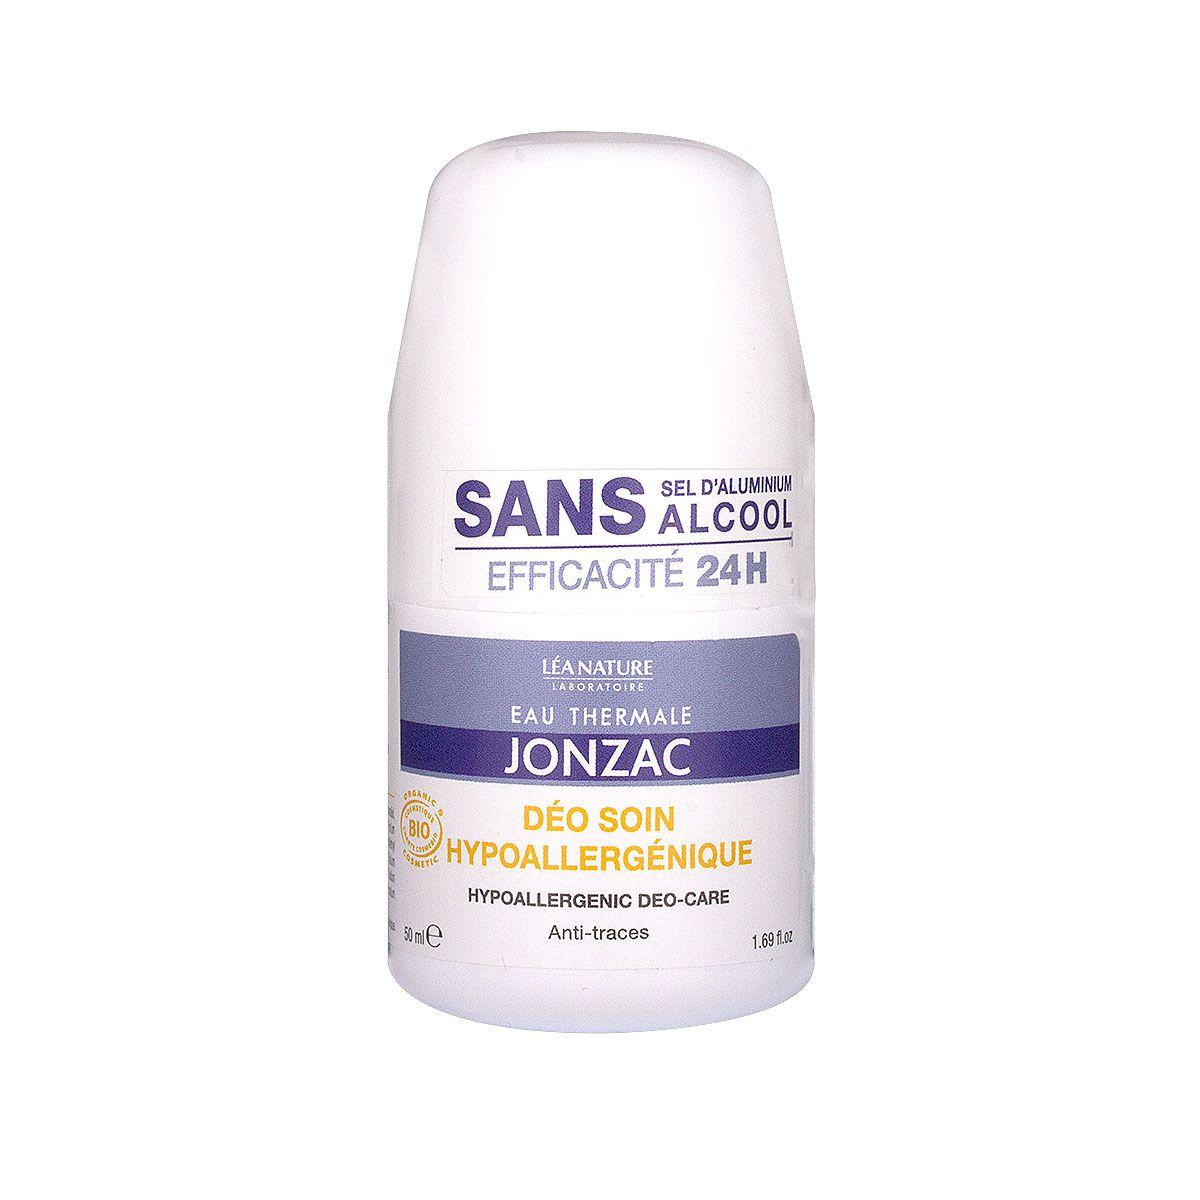 deo-soin-hypoallergenique-50mlfeature1625057643.jpg